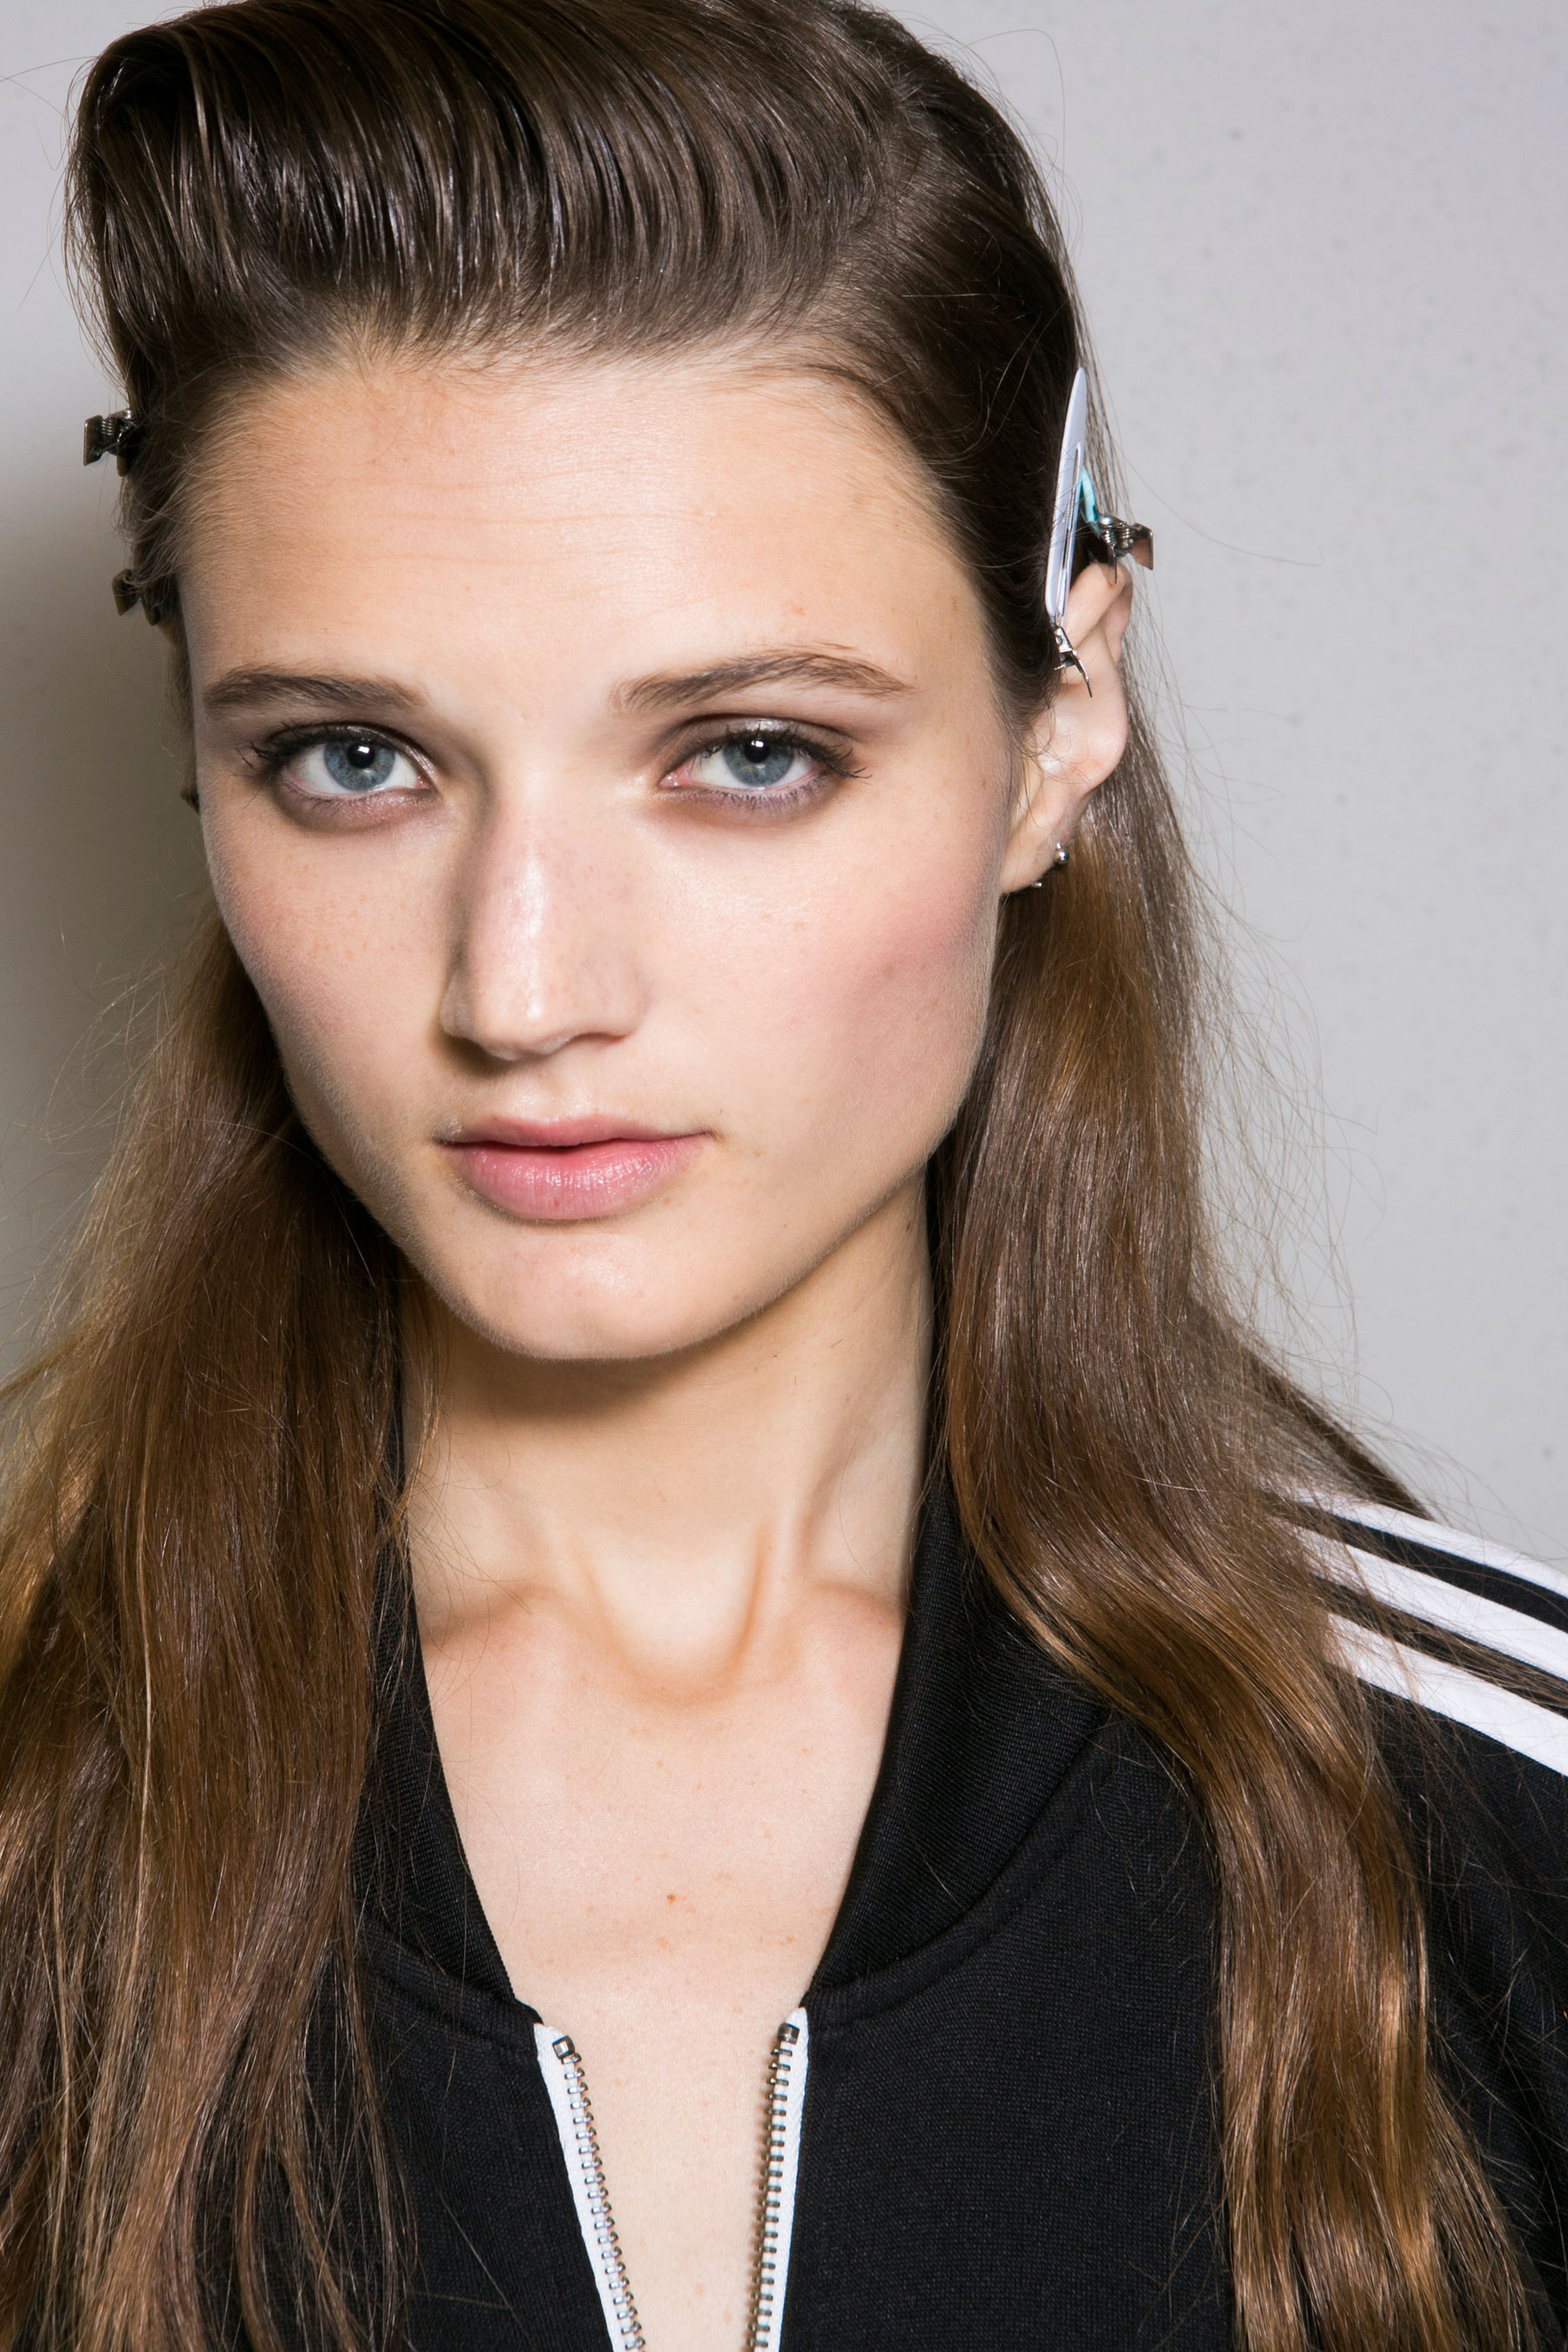 Roberto-Cavalli-Backstage-beauty-spring-2016-close-up-fashion-show-the-impression-026